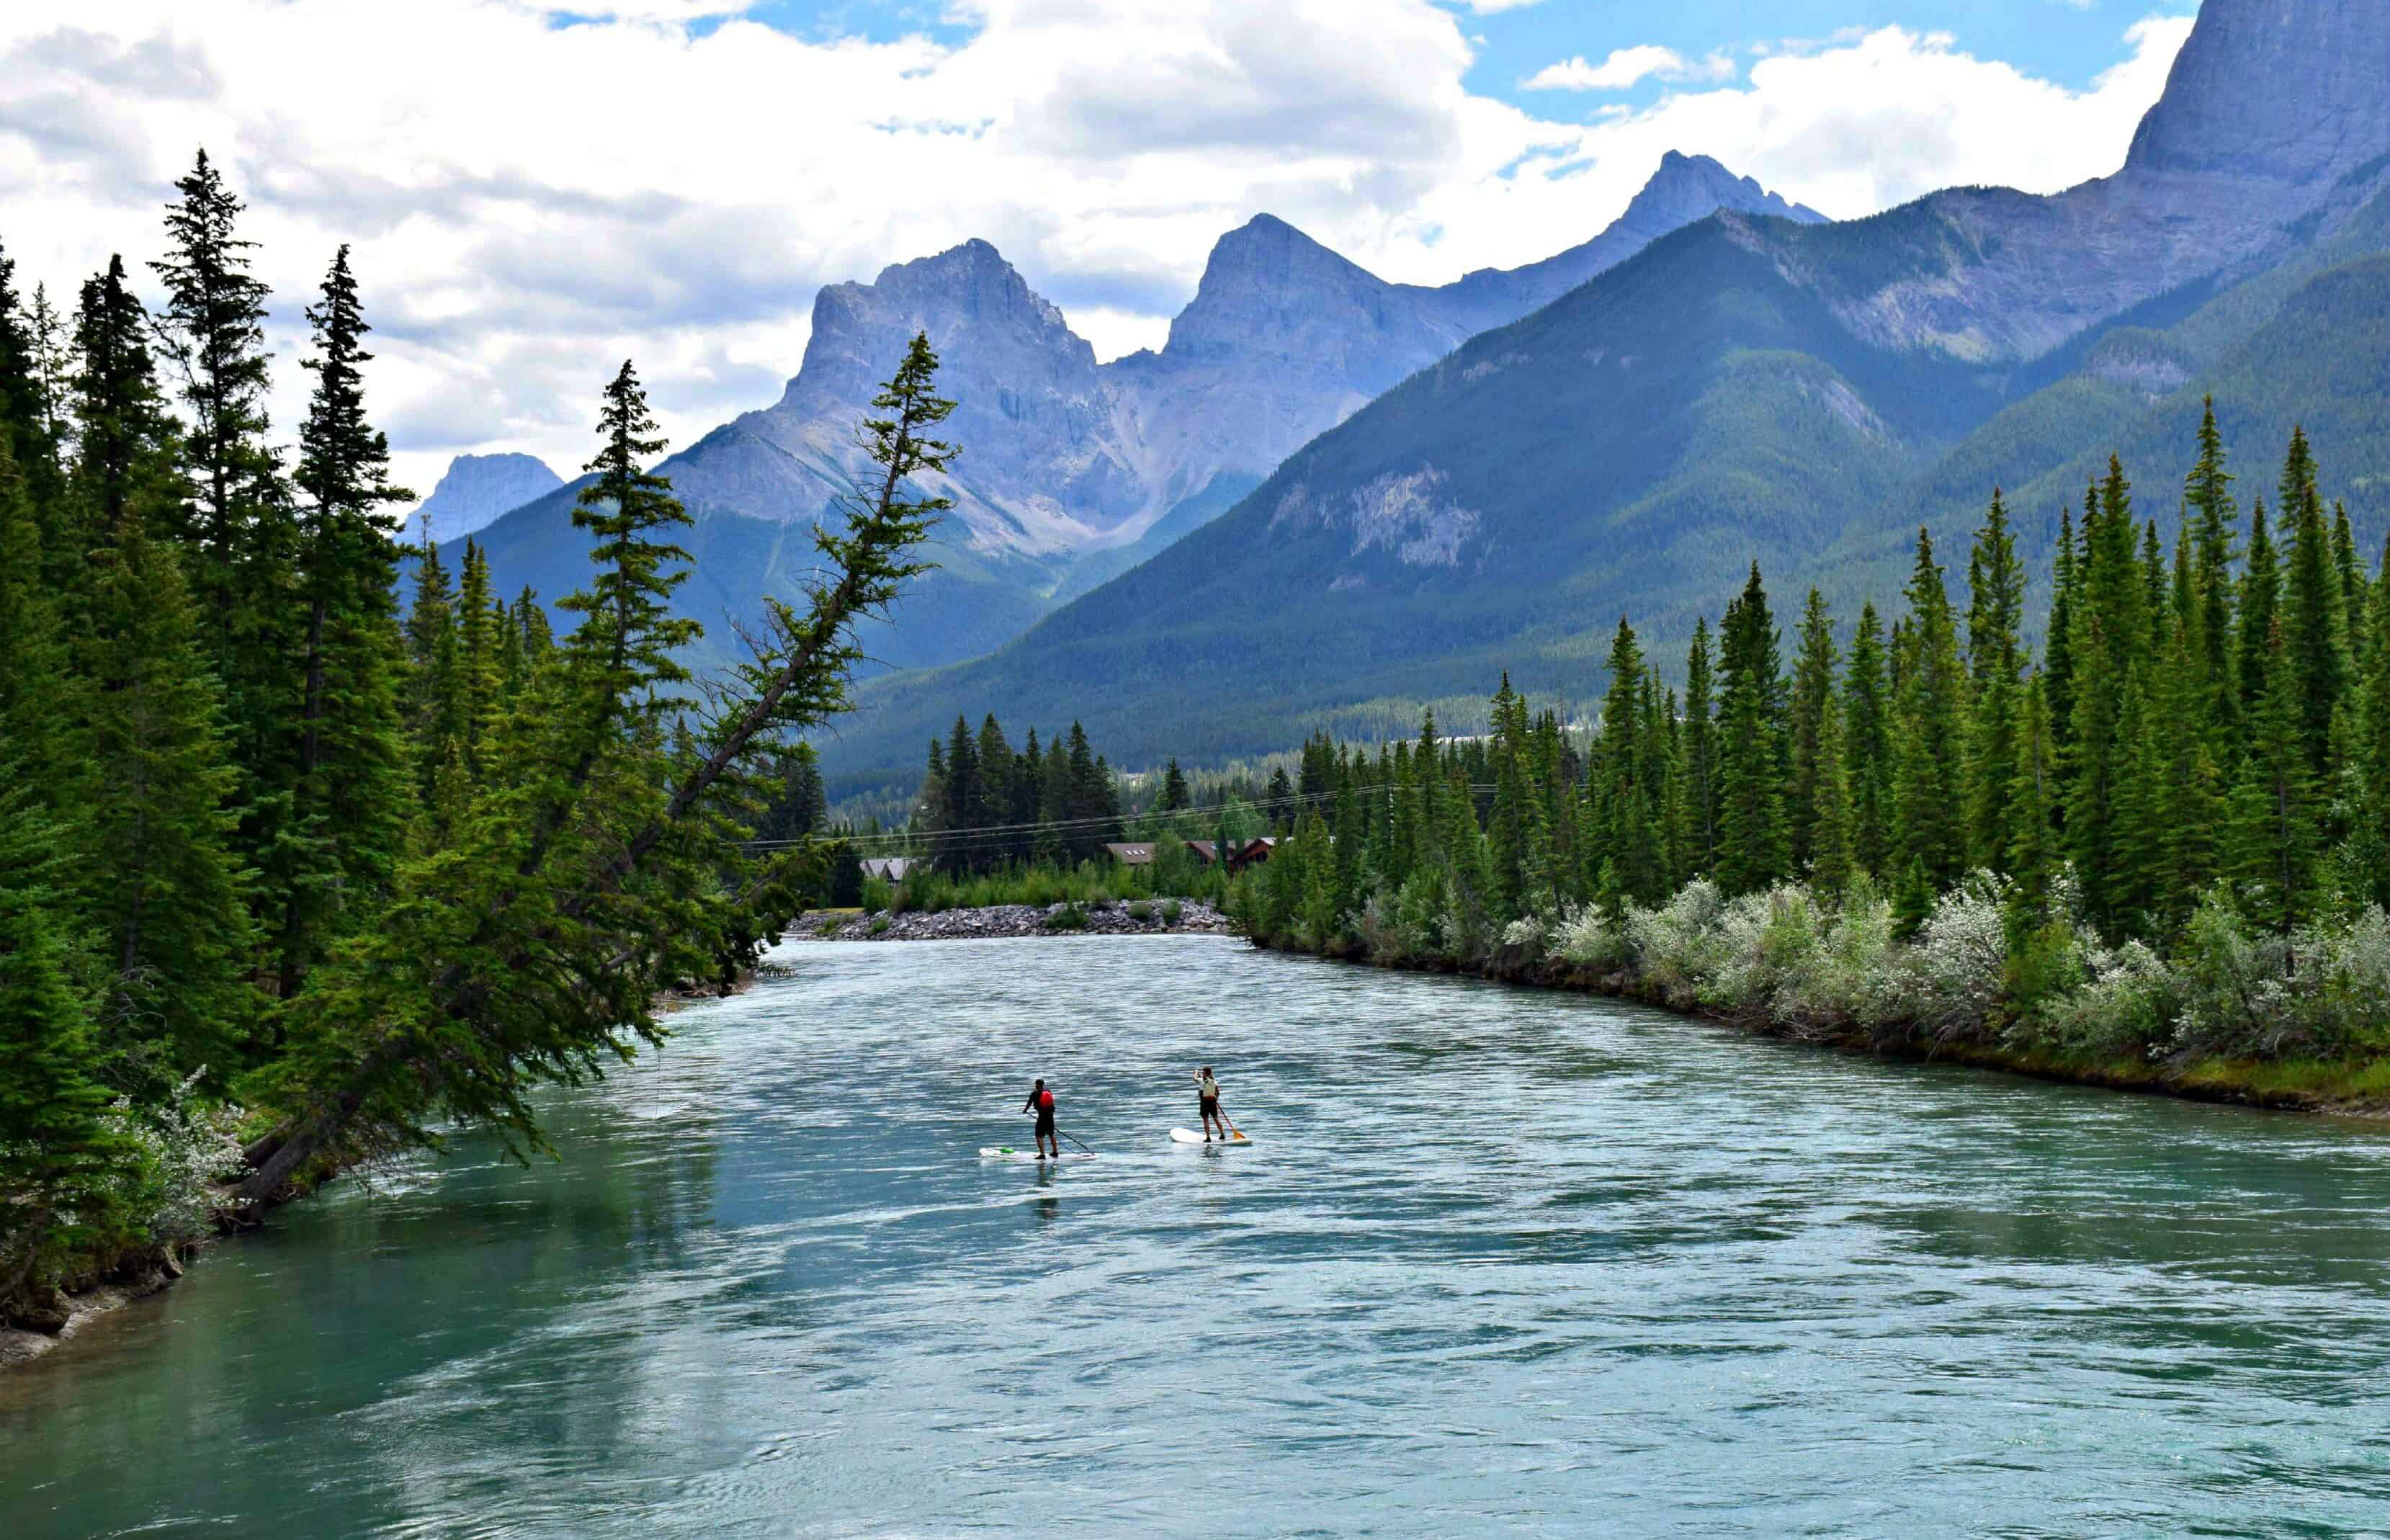 Bow River, Canmore, Alberta, Canada